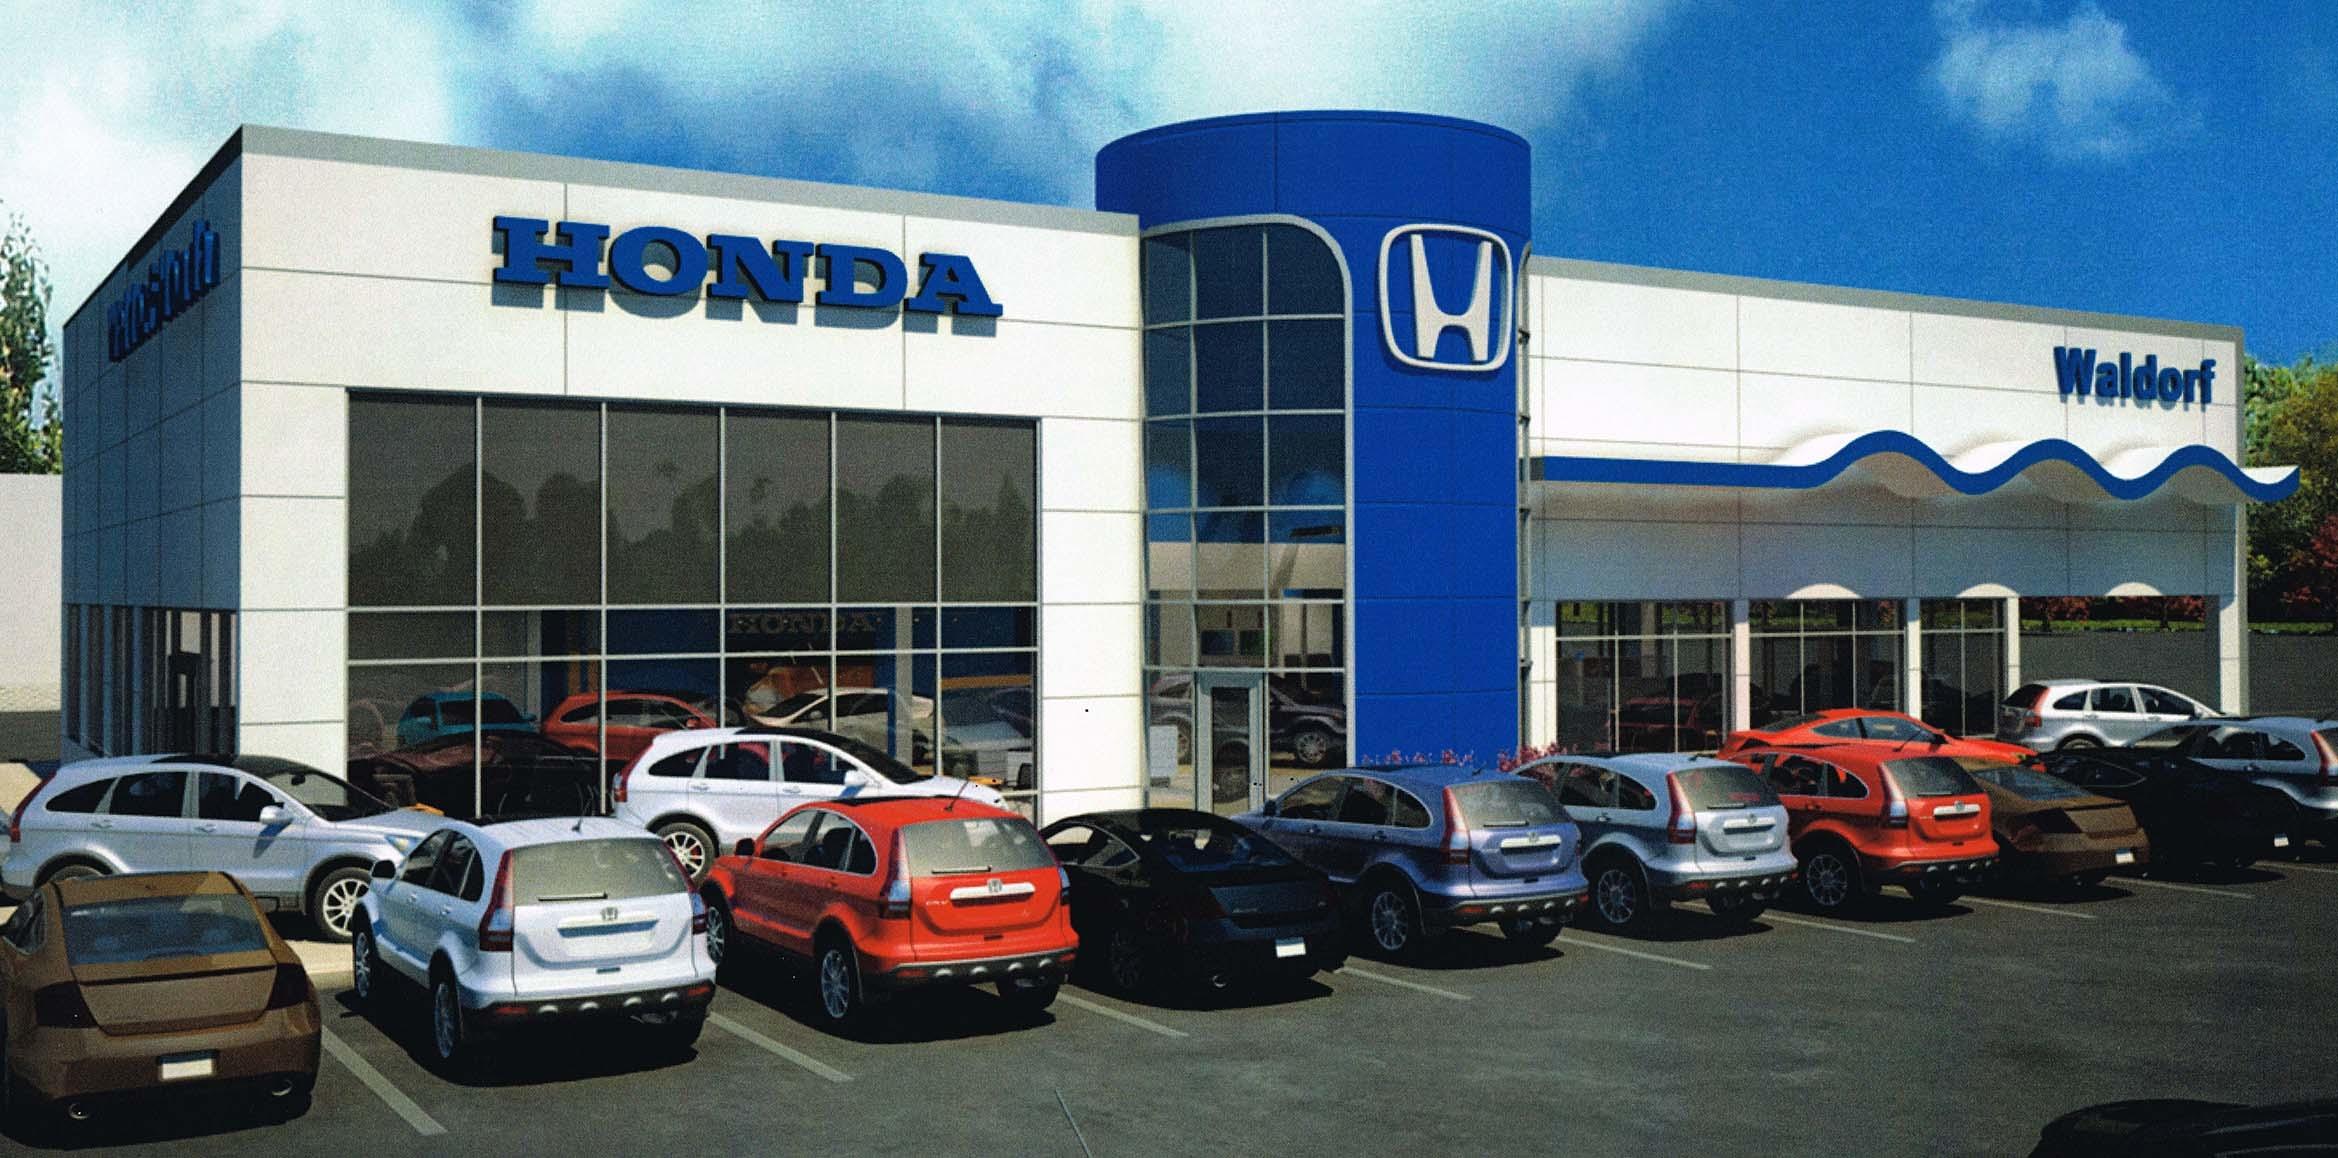 Waldorf honda in waldorf md 20601 for Honda dealership waldorf md